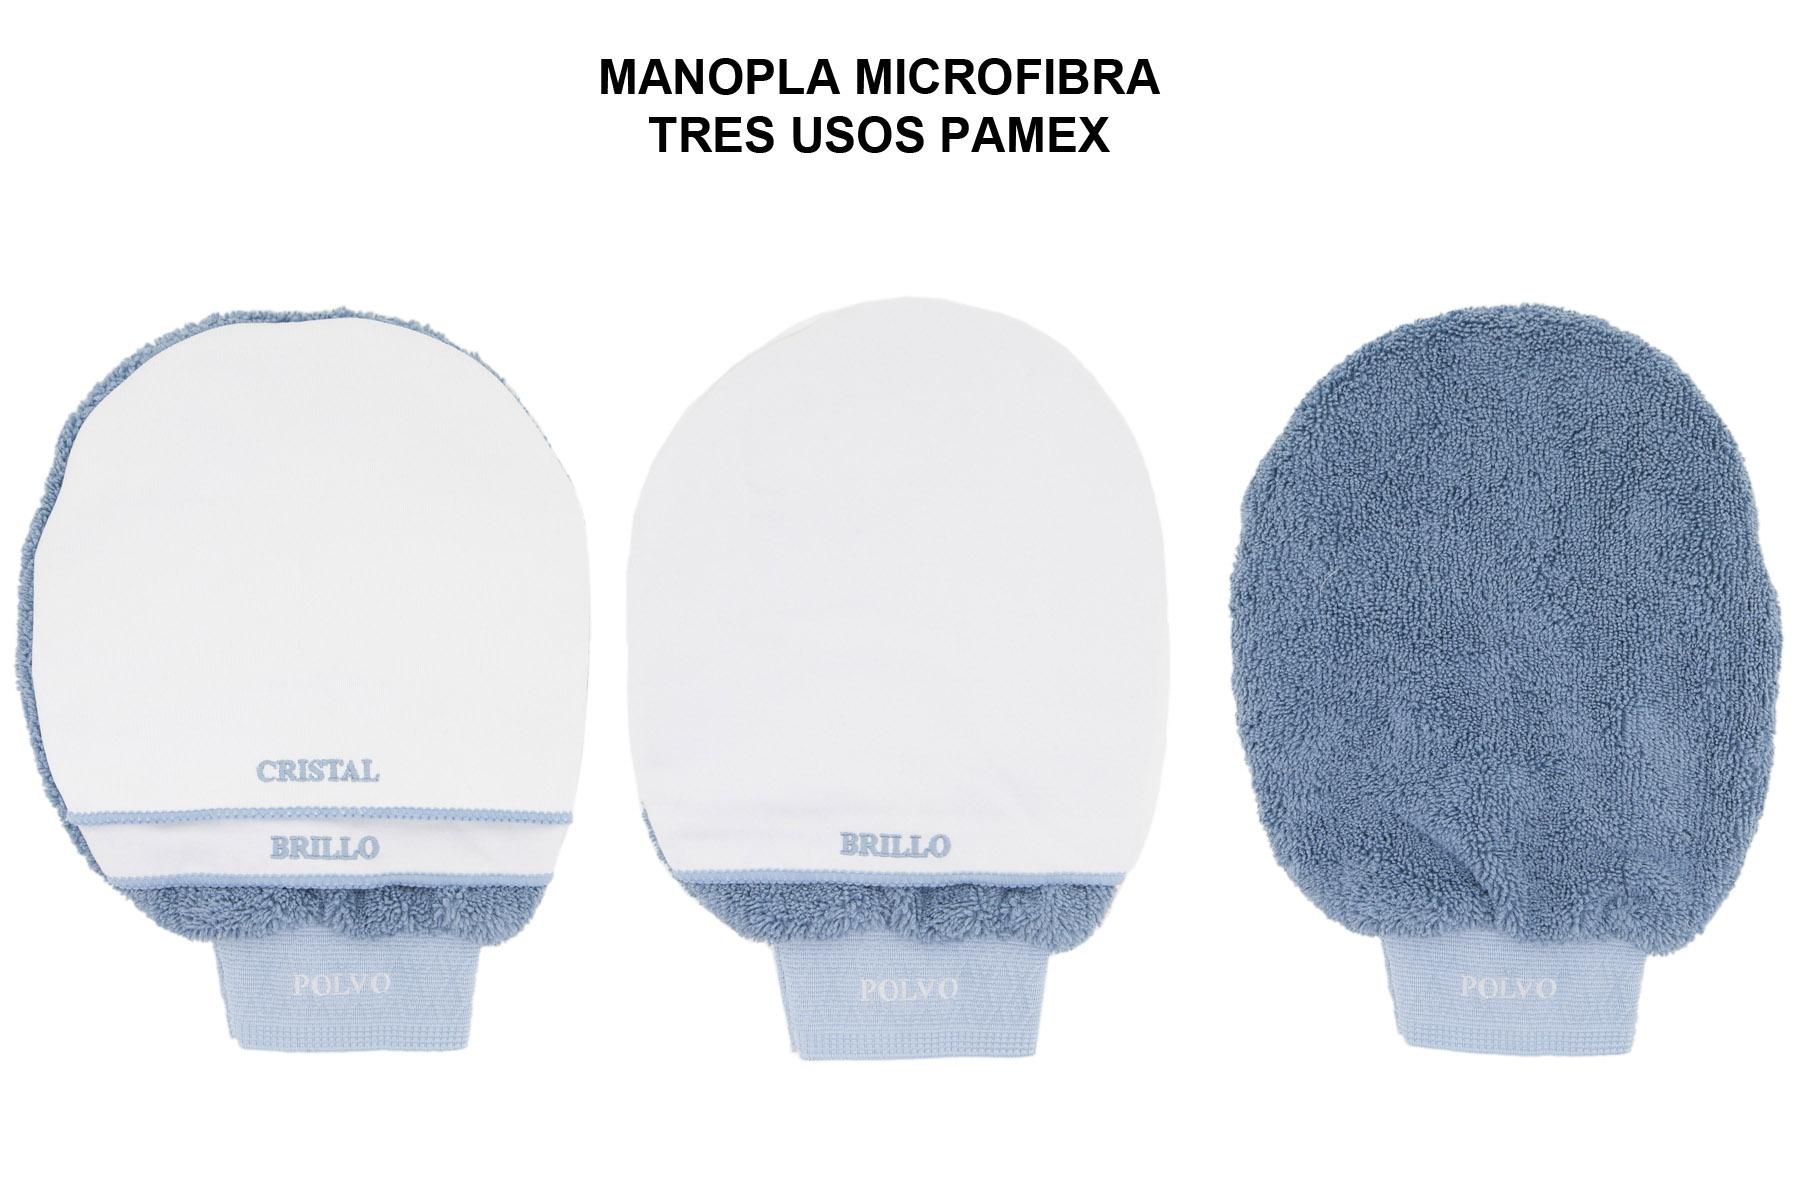 MANOPLA MICROFIBRA TRES USOS PAMEX